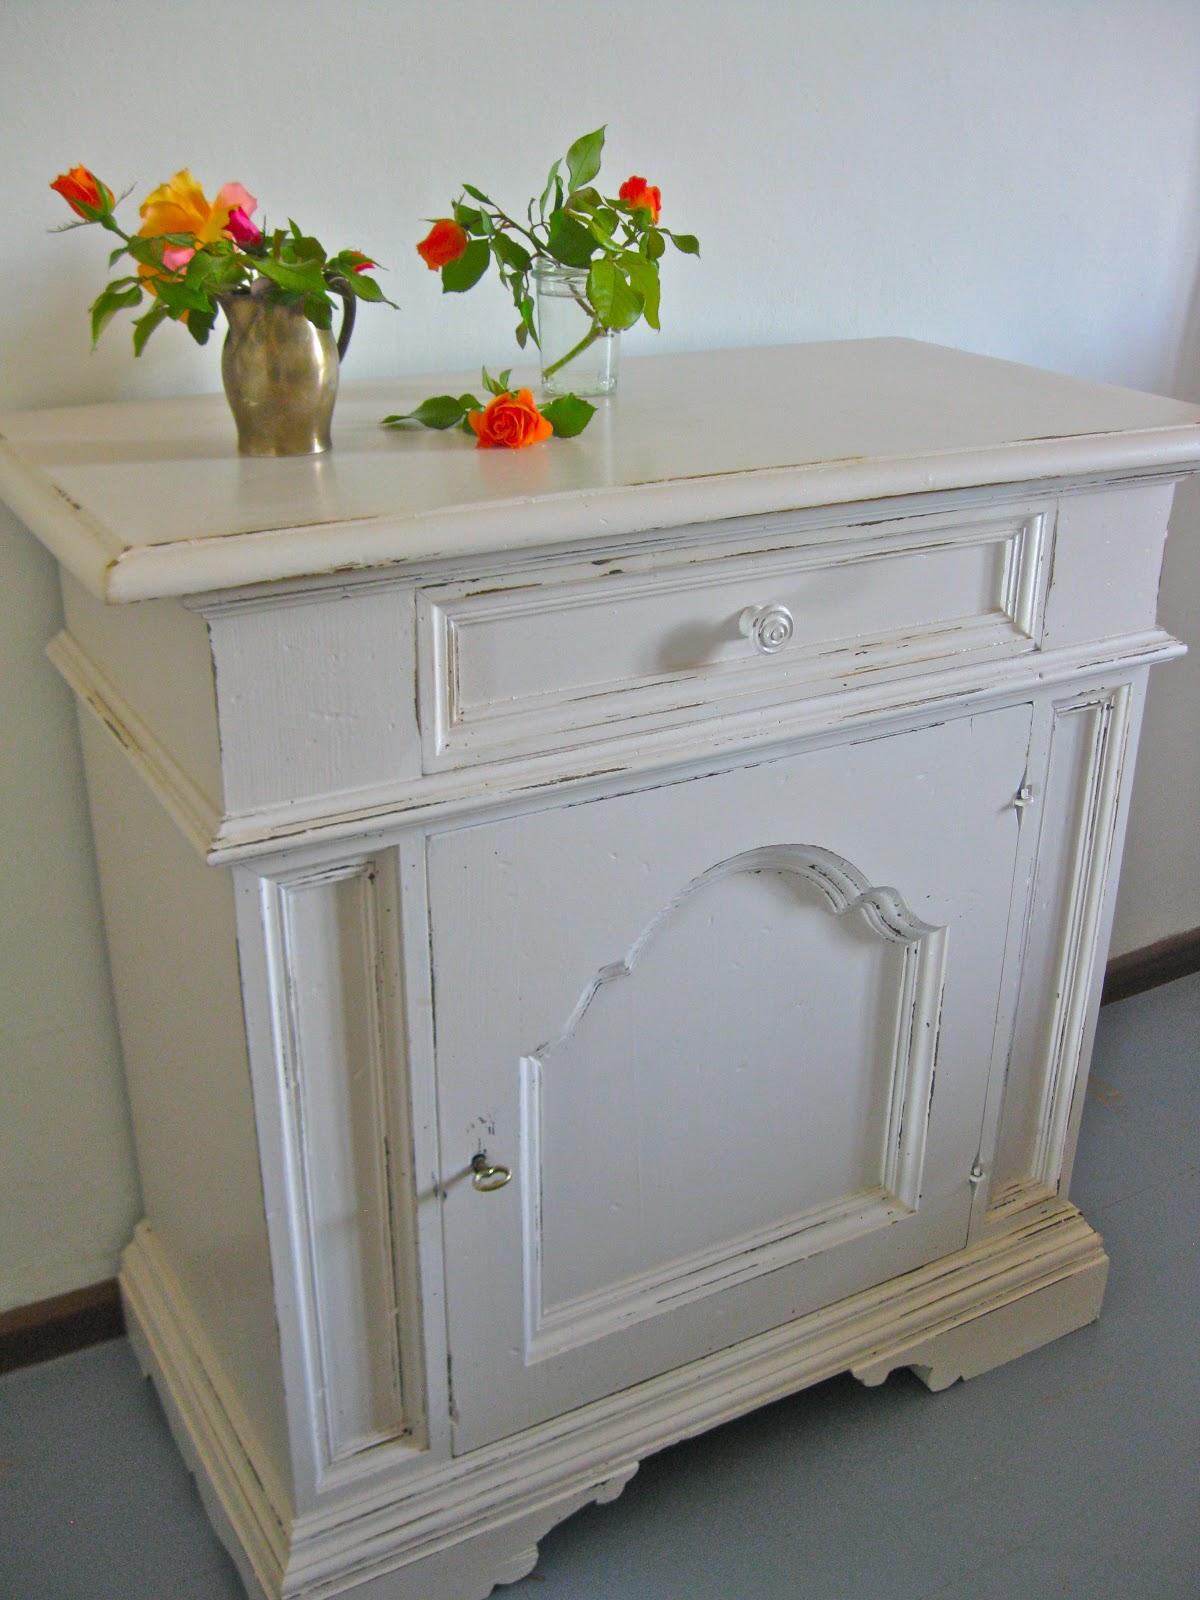 sette design how to shabby chic furniture. Black Bedroom Furniture Sets. Home Design Ideas